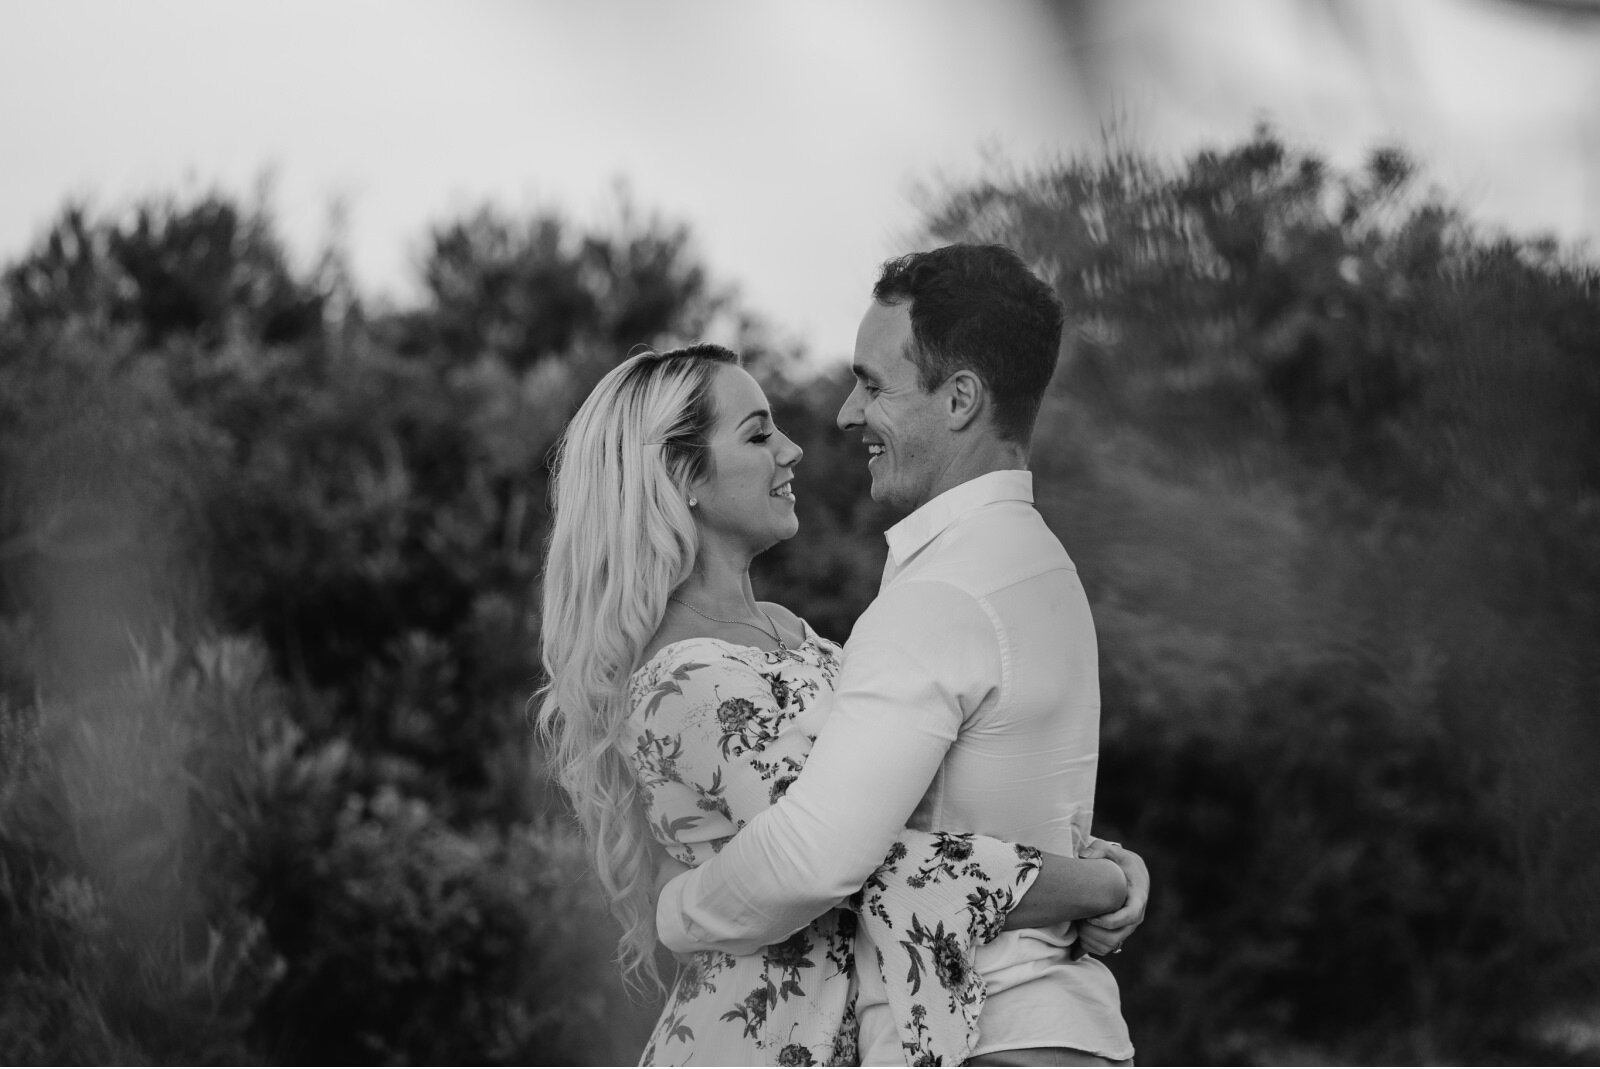 newcastle-wedding-photographer-dudley-engagement-shoot-18.jpg